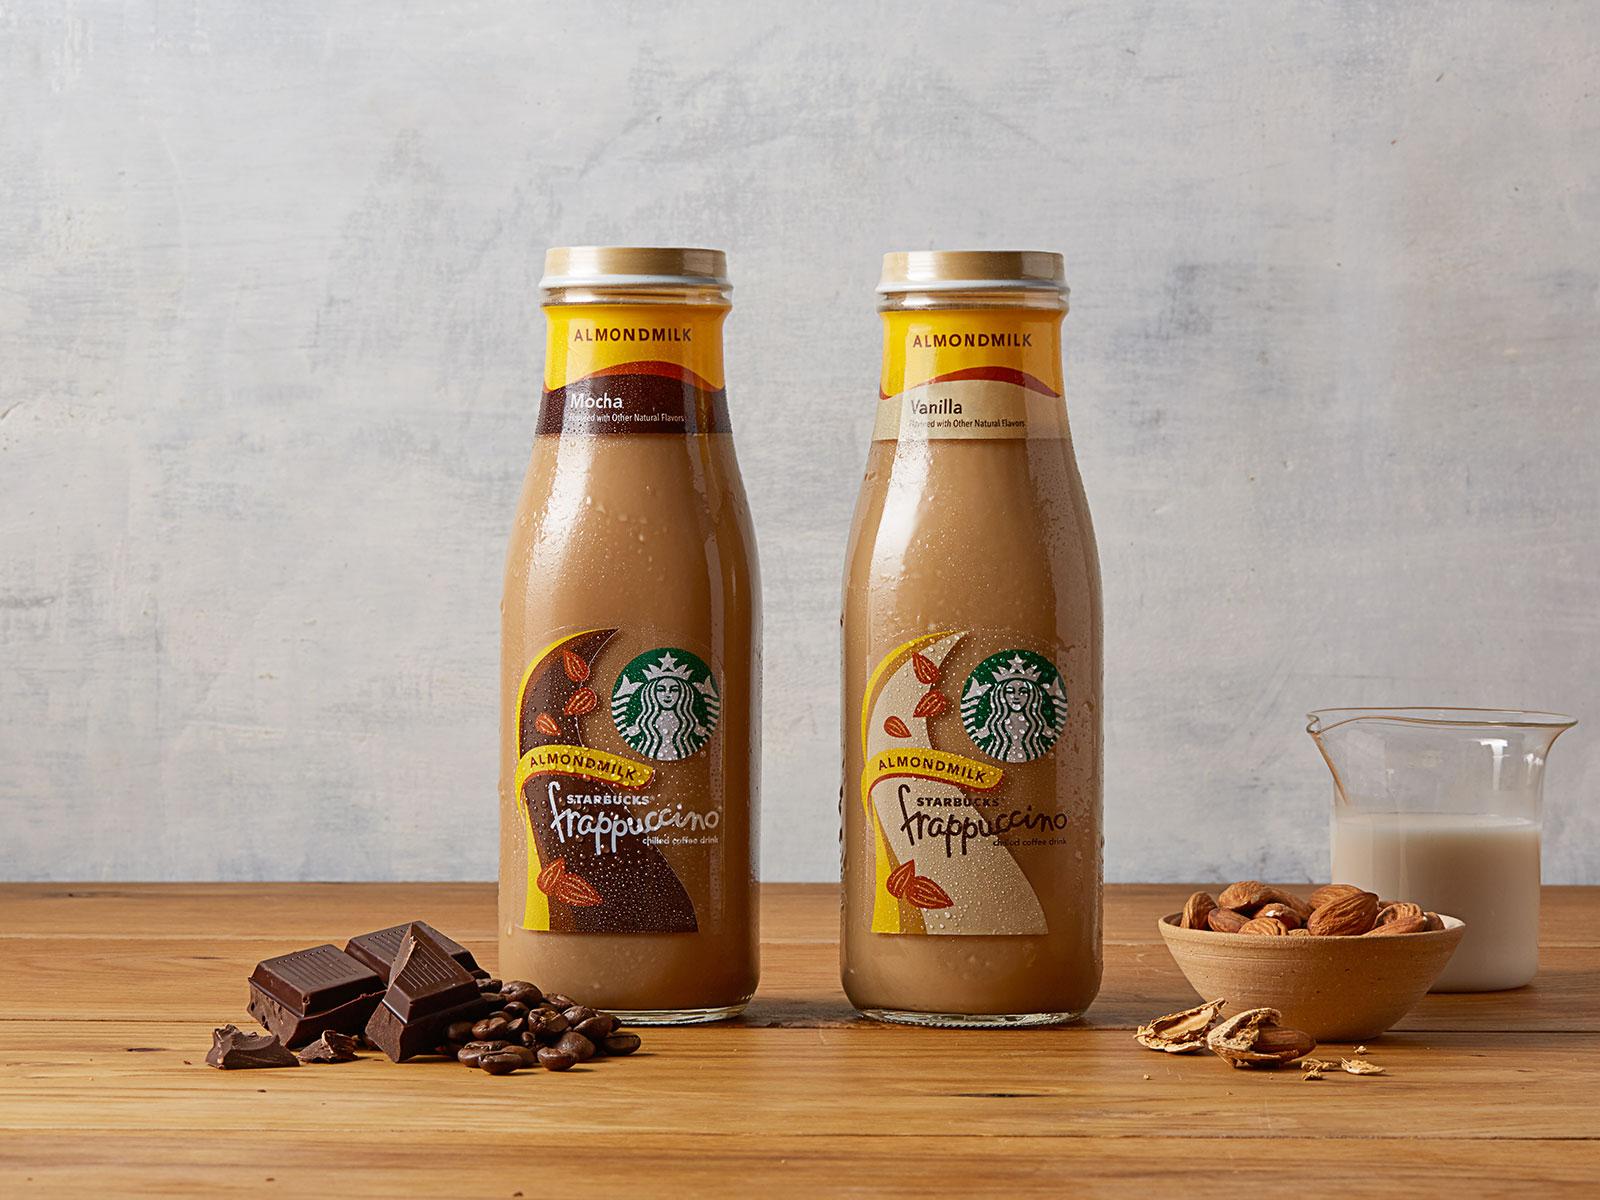 almond milk frap from starbucks